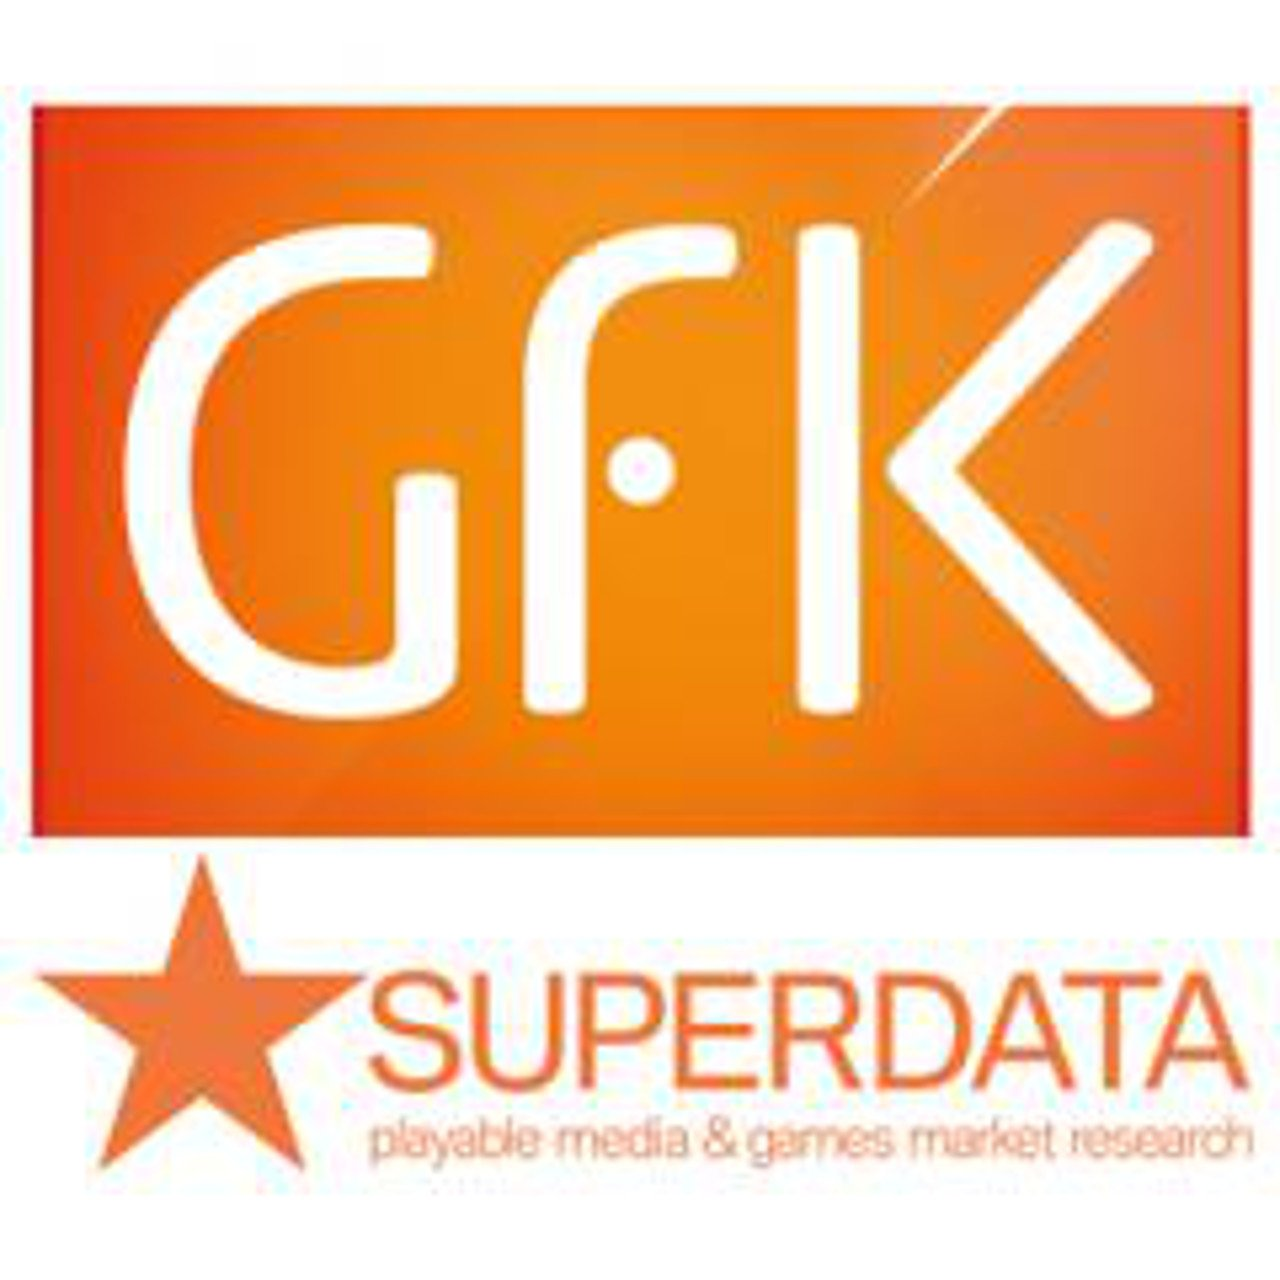 gfk-superdata-news